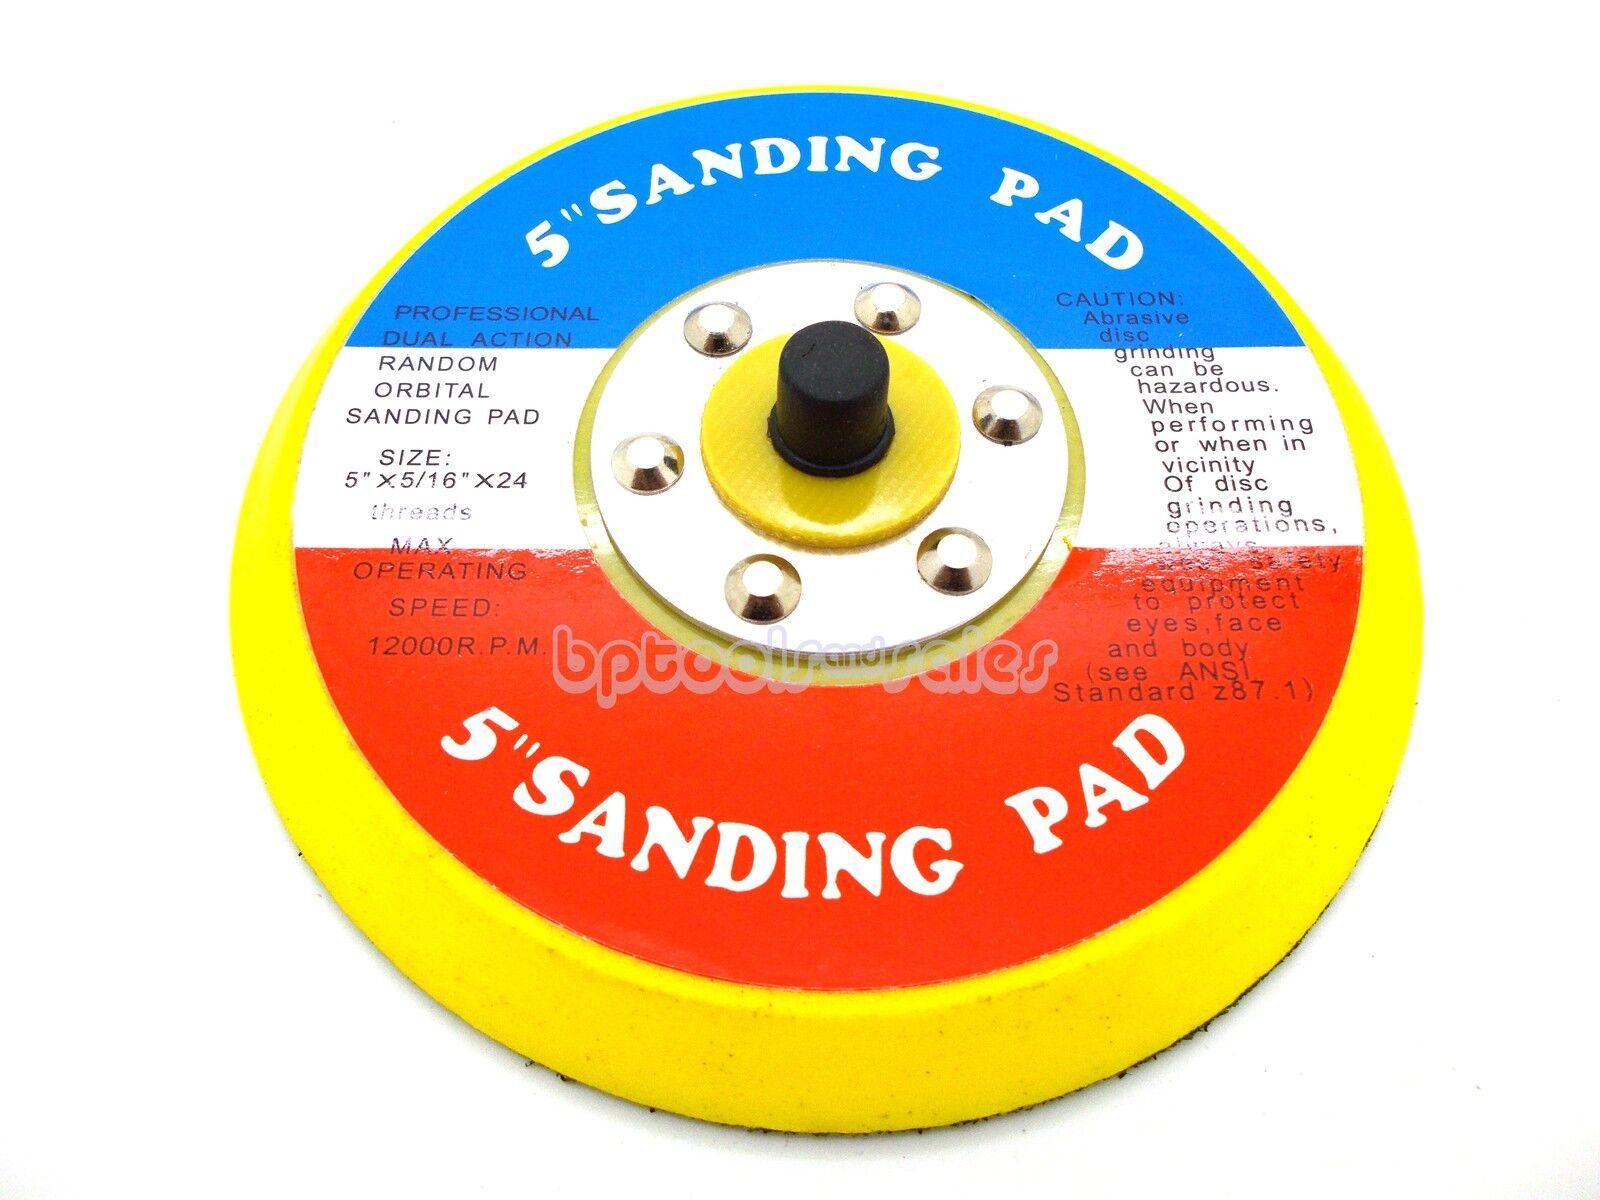 5 Sanding Dual Action Random Orbital Sanding Pad 12000RPM Palm Sander Pad. Available Now for 99.99